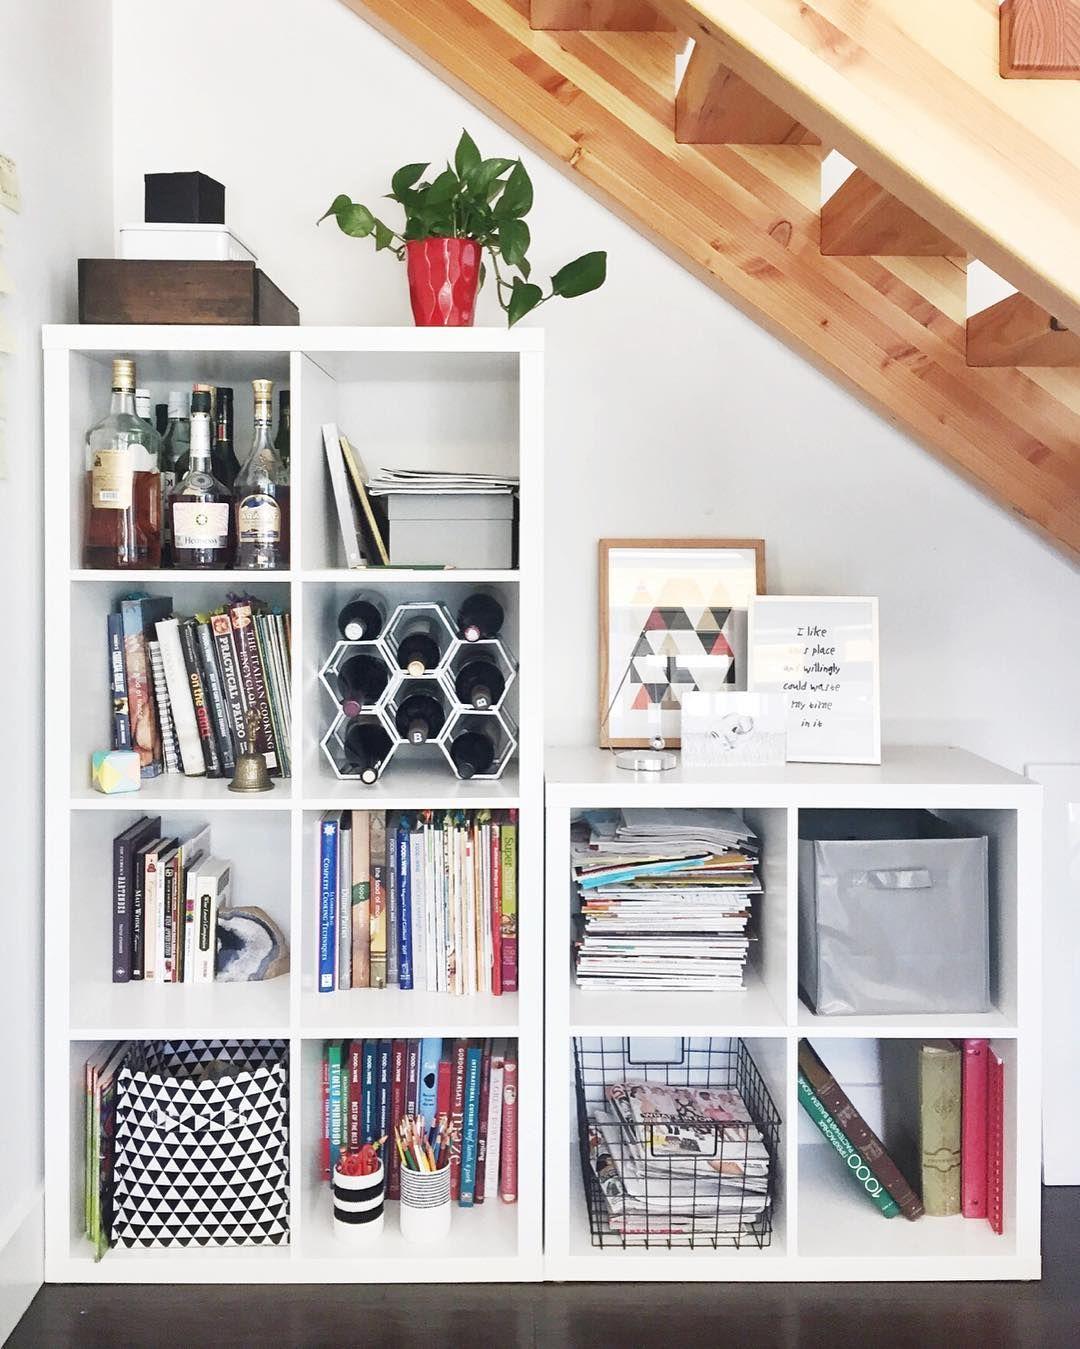 two ikea shelves 06place home ideas ikea room kallax rh pinterest com